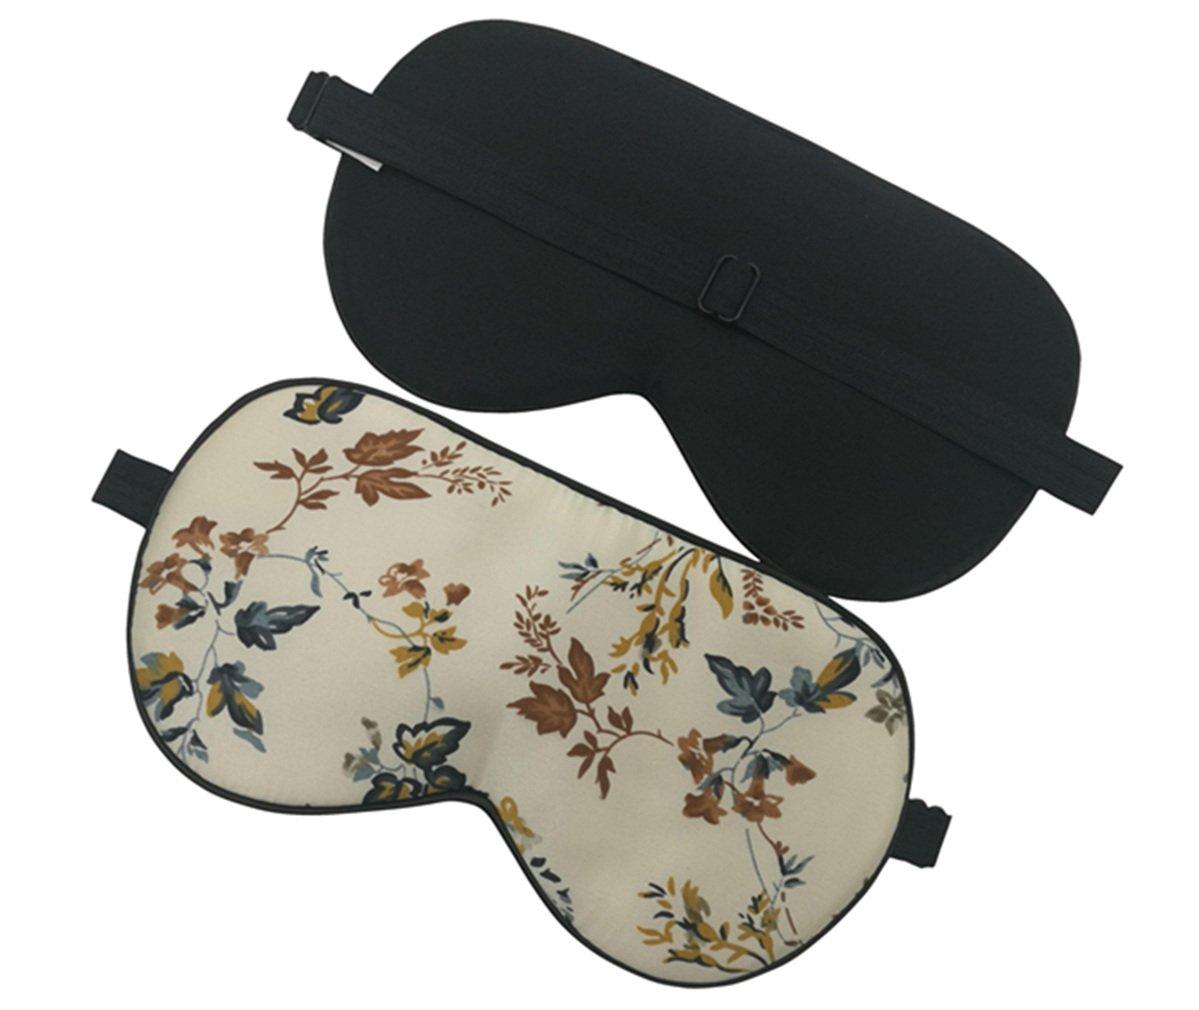 Maxfeel Feel 100% Pure Silk Eye Mask Sleep Eye Mask Eye Cover Eyeshade Sleeping Eye Mask Floral Colors (#35) SEM-AP